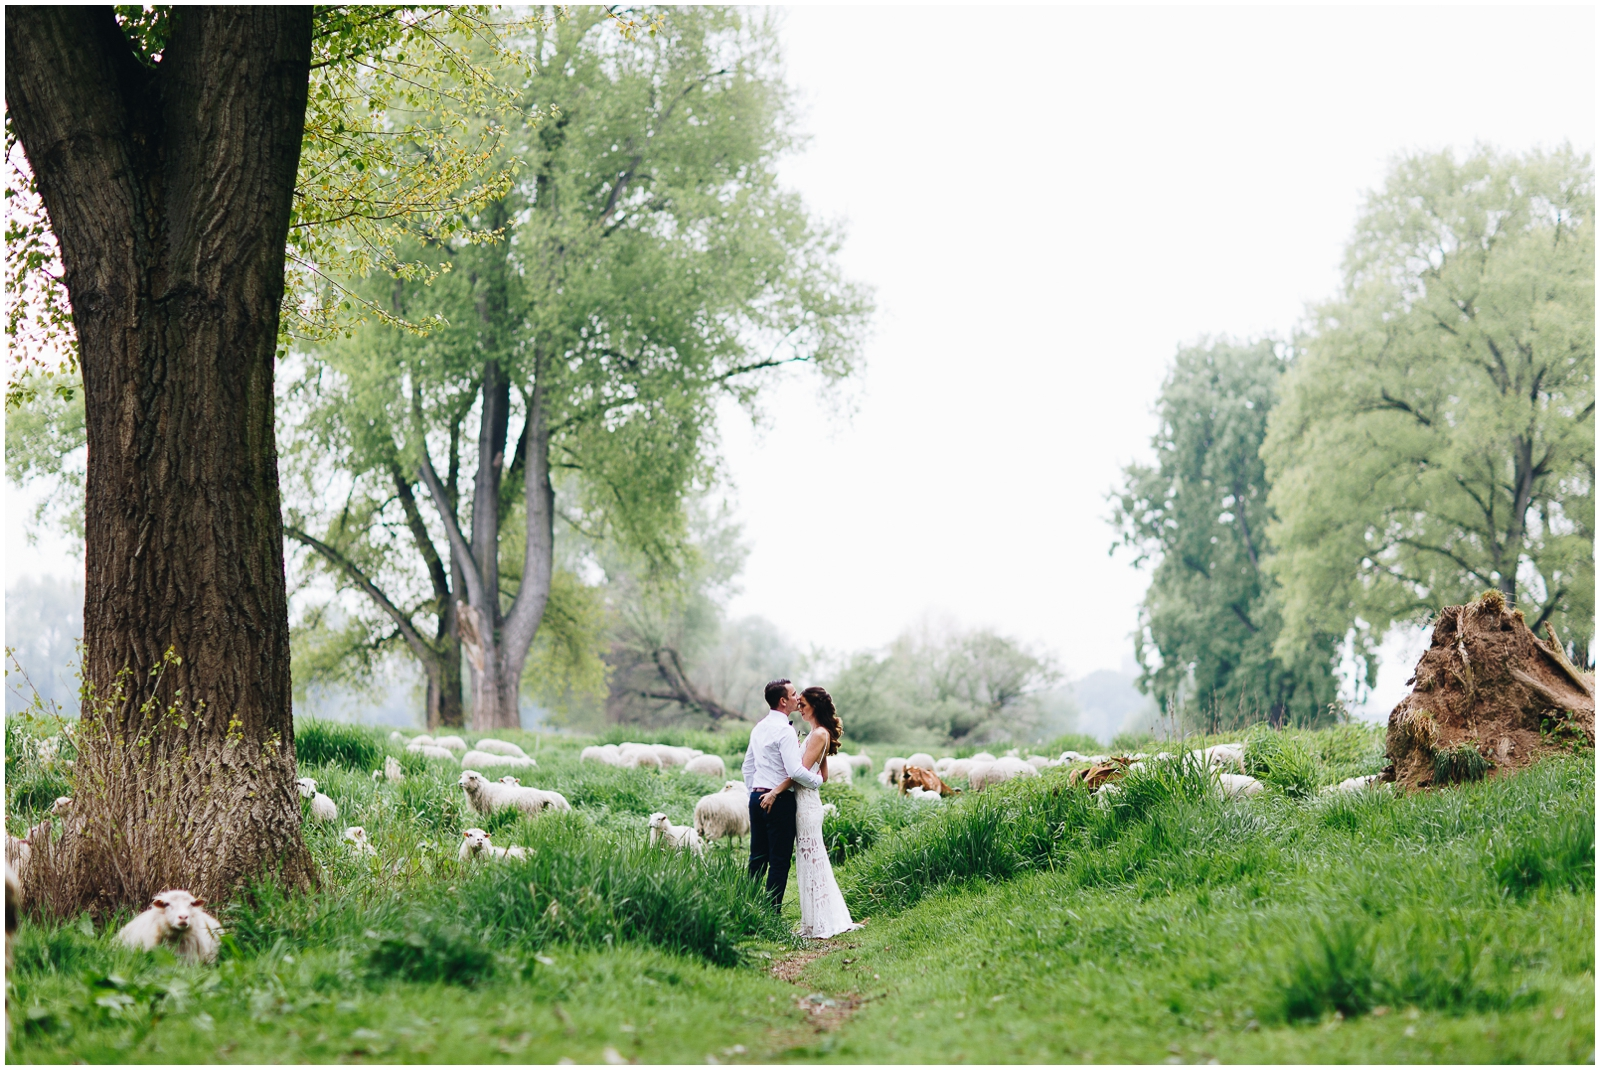 LE HAI LINH Photography-Hochzeitsfotograf-Bohohochzeit-_0055.jpg